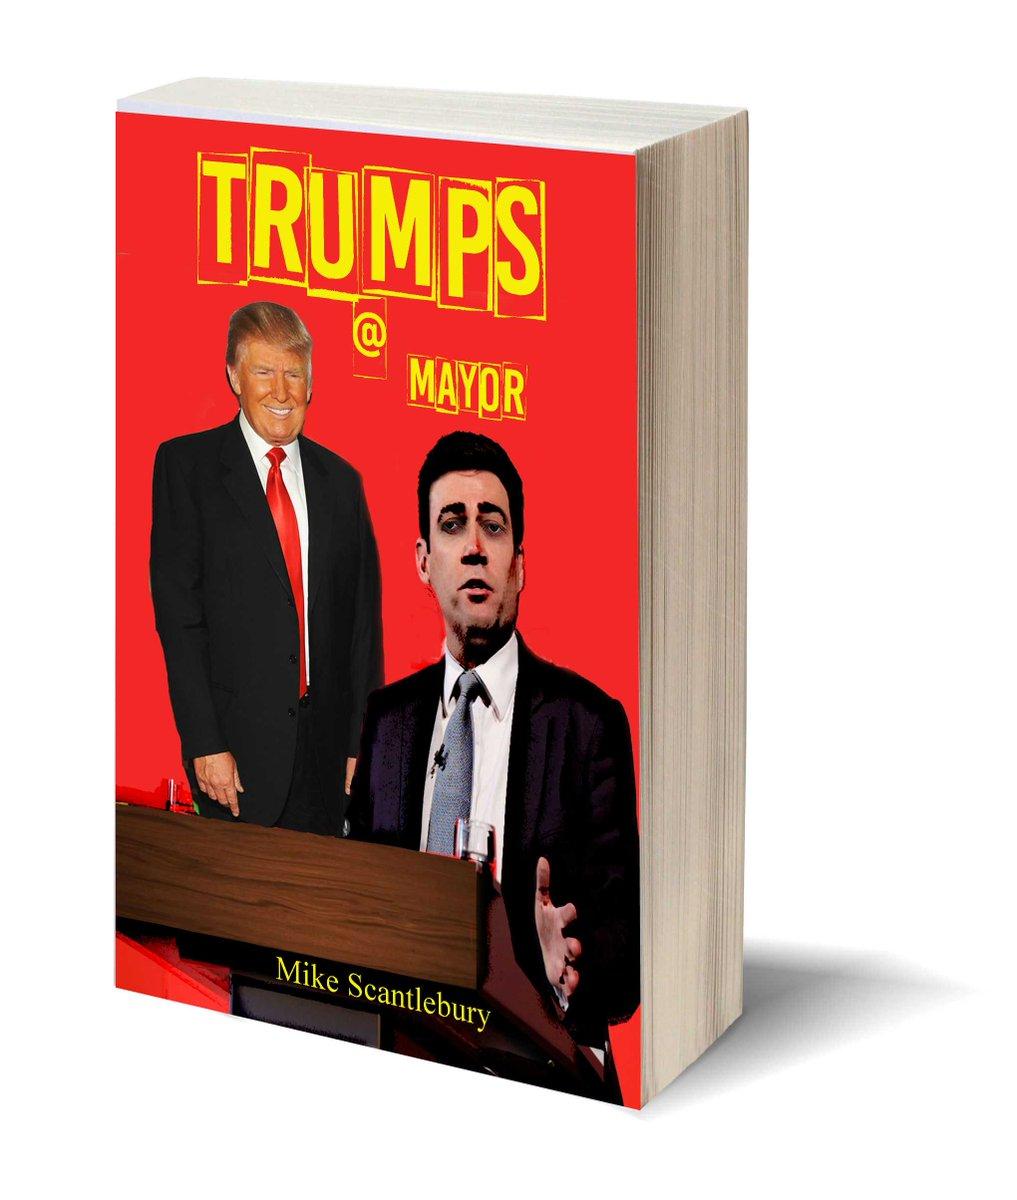 Cast your      Nominate TRUMPS A MAYOR  http:// bit.ly/TrumpsAMayor  &nbsp;     http:// wp.me/P5rIsN-2U4  &nbsp;   @MikeScantlebury #IAN1 #ASMSG #fridayreads <br>http://pic.twitter.com/5zYPttTPSX